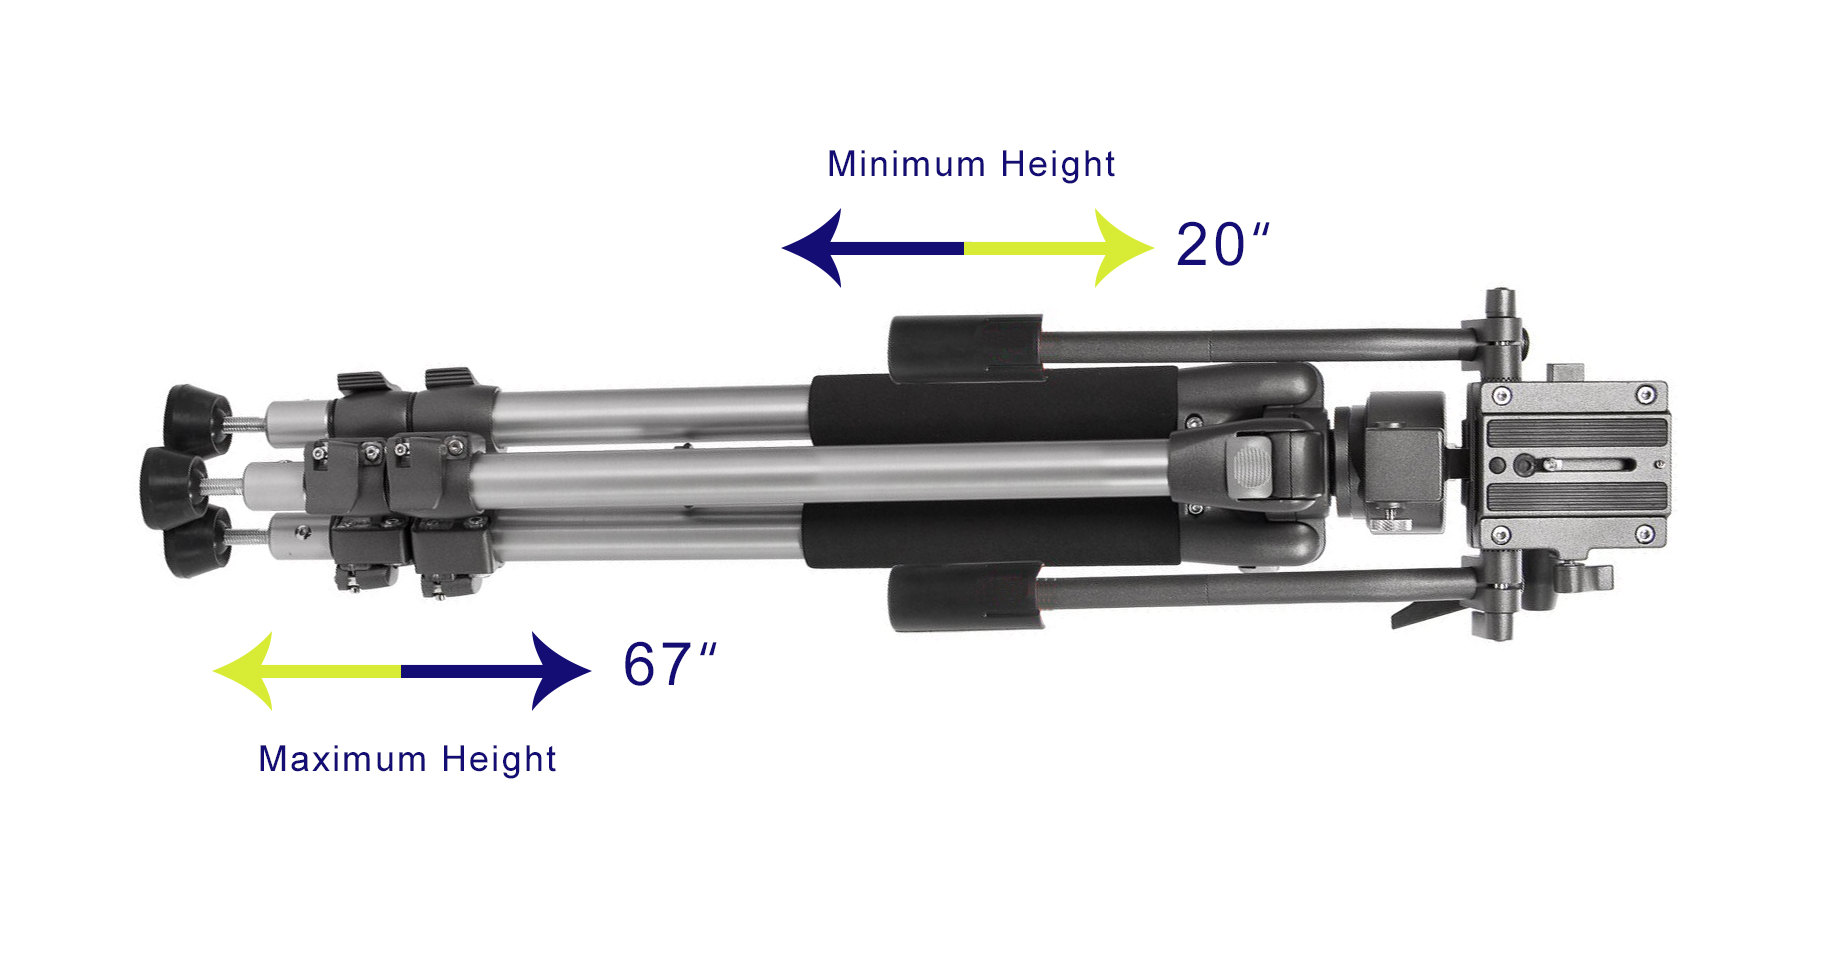 Bubble Level Professional Dual Handle Aluminum 67 Tripod for Panasonic Lumix DMC-LX3